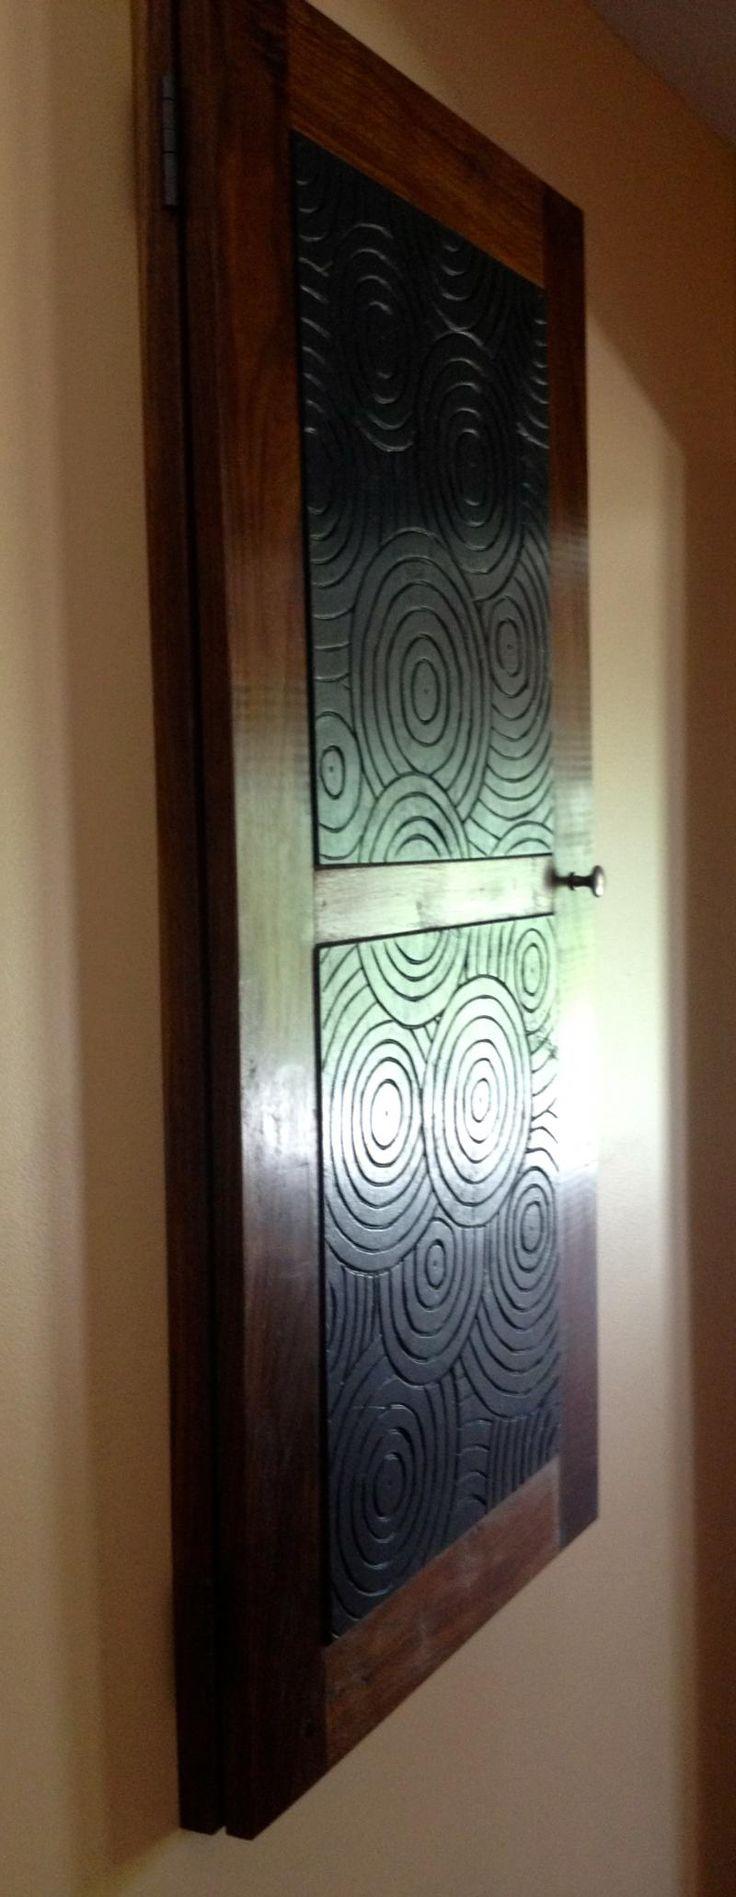 hight resolution of andrew gore woodworks custom work cover for breaker box